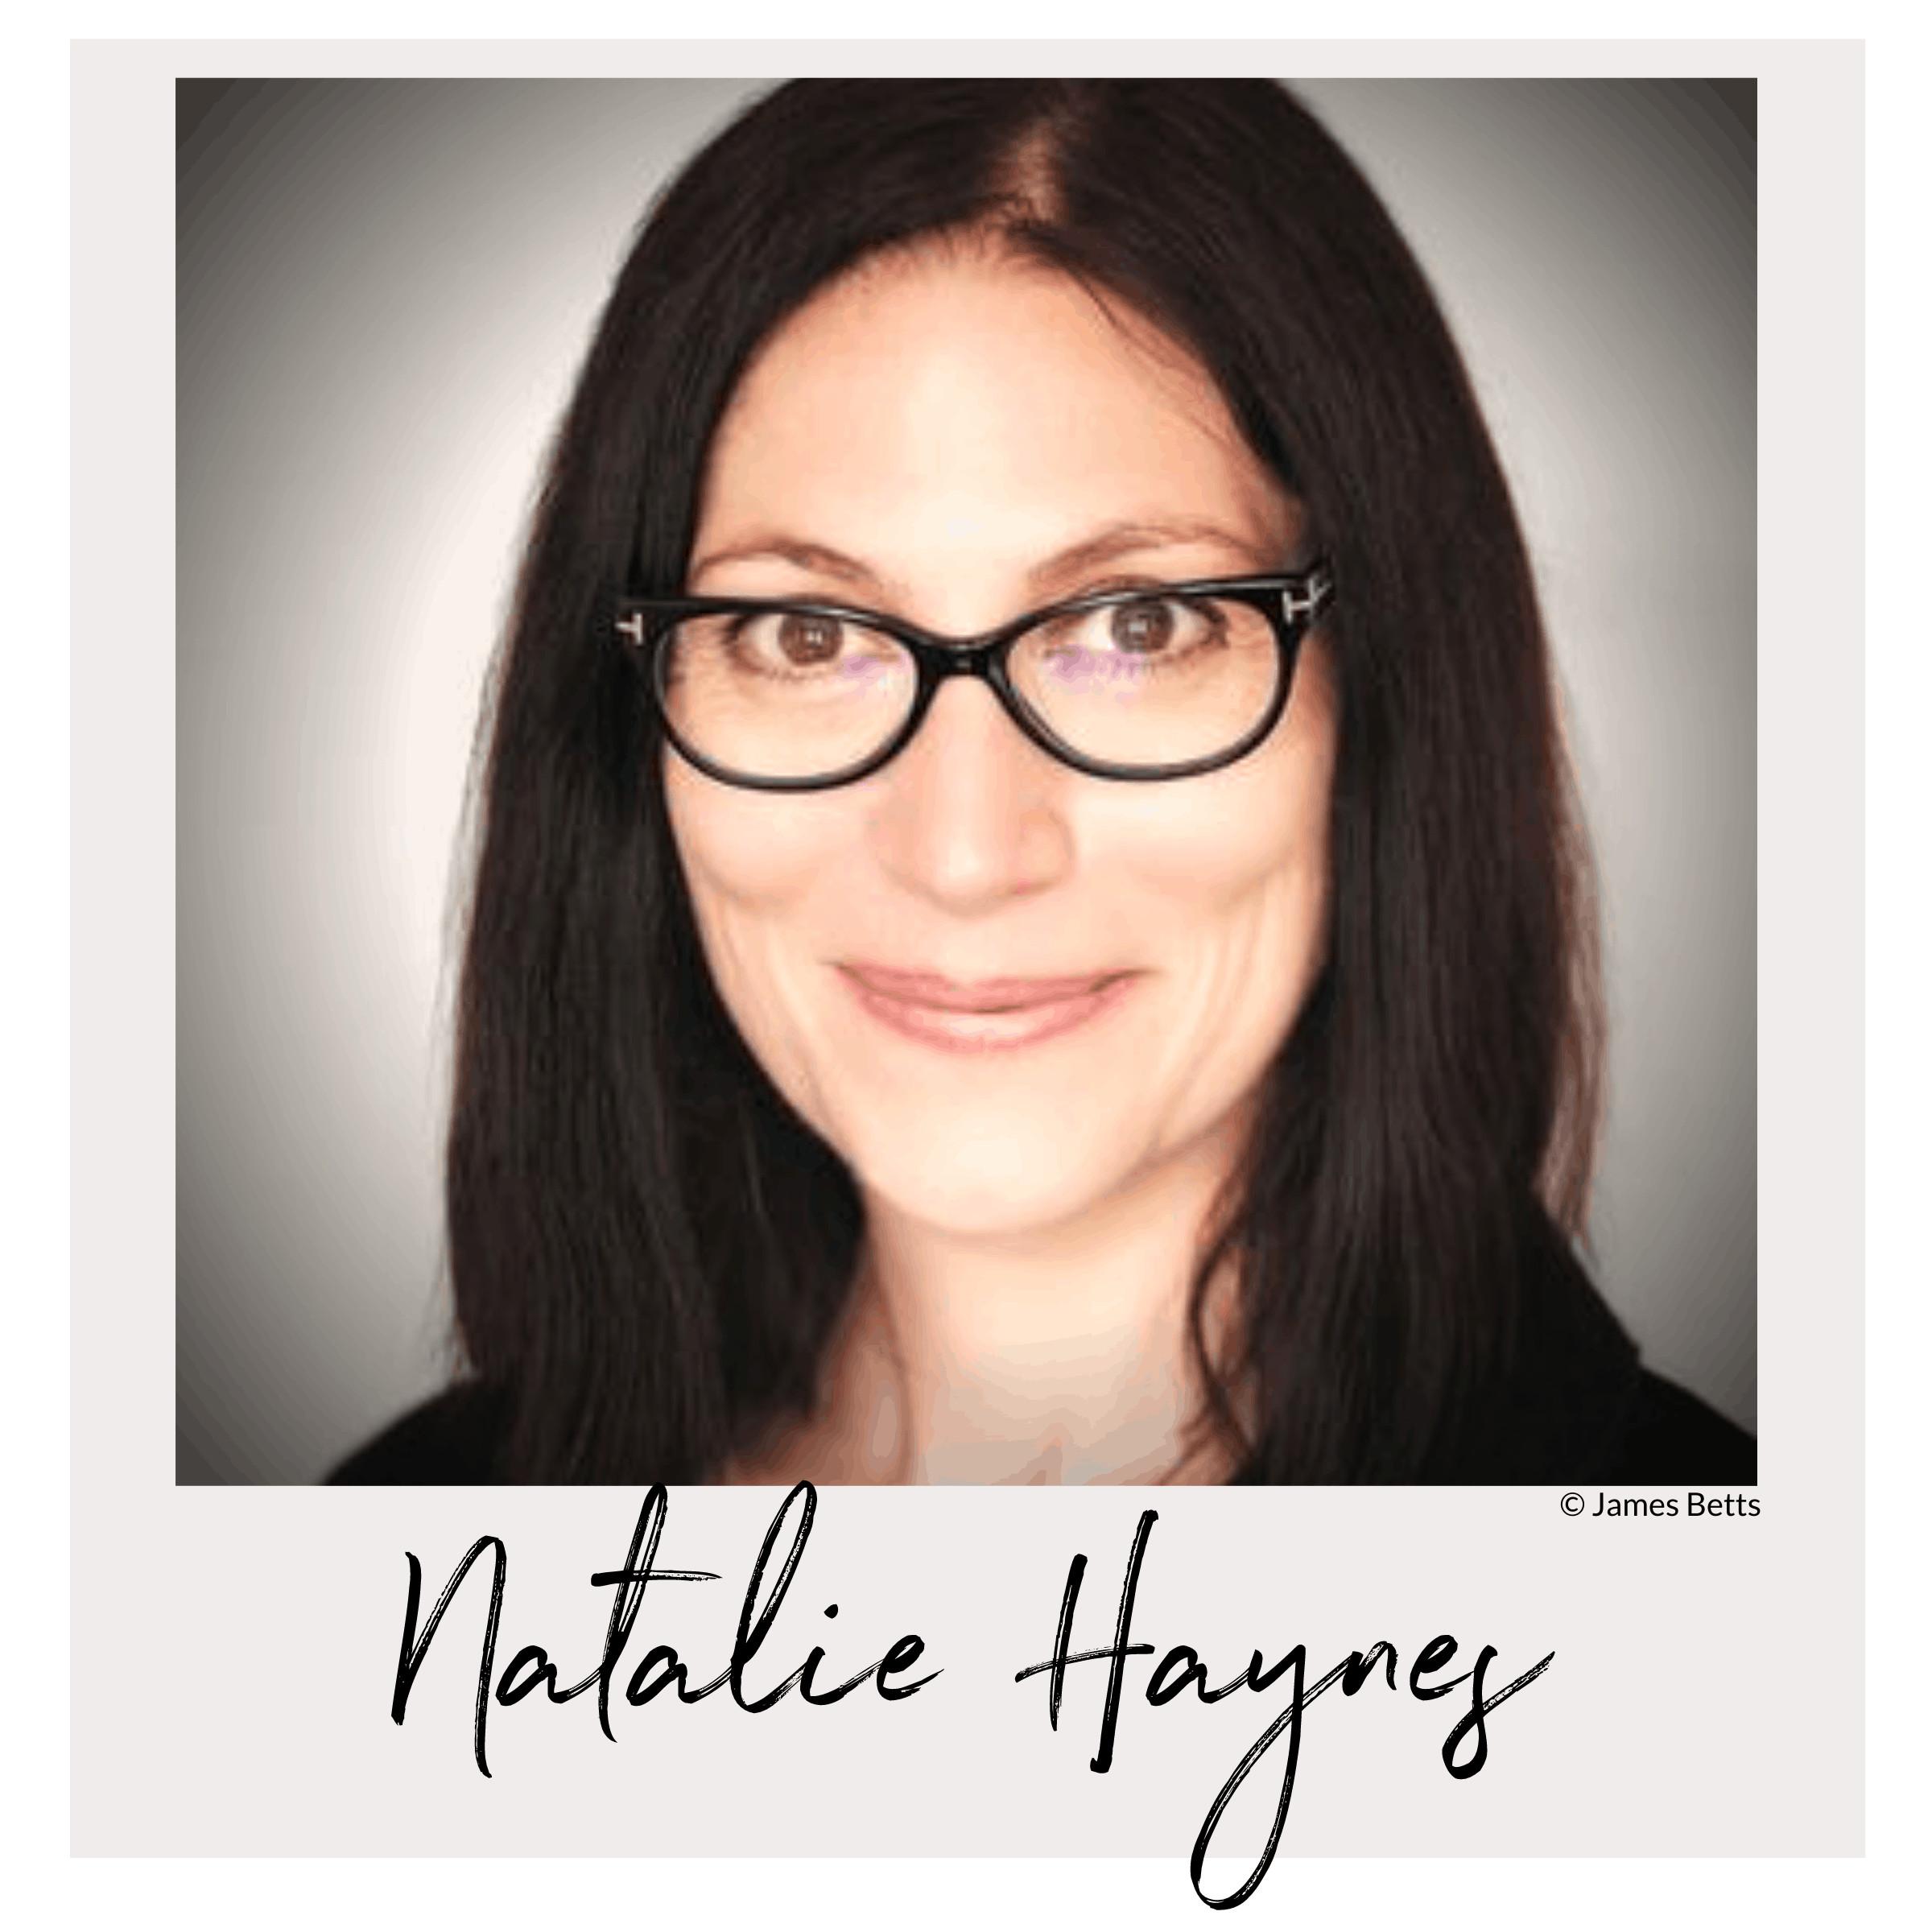 Author Natalie Haynes